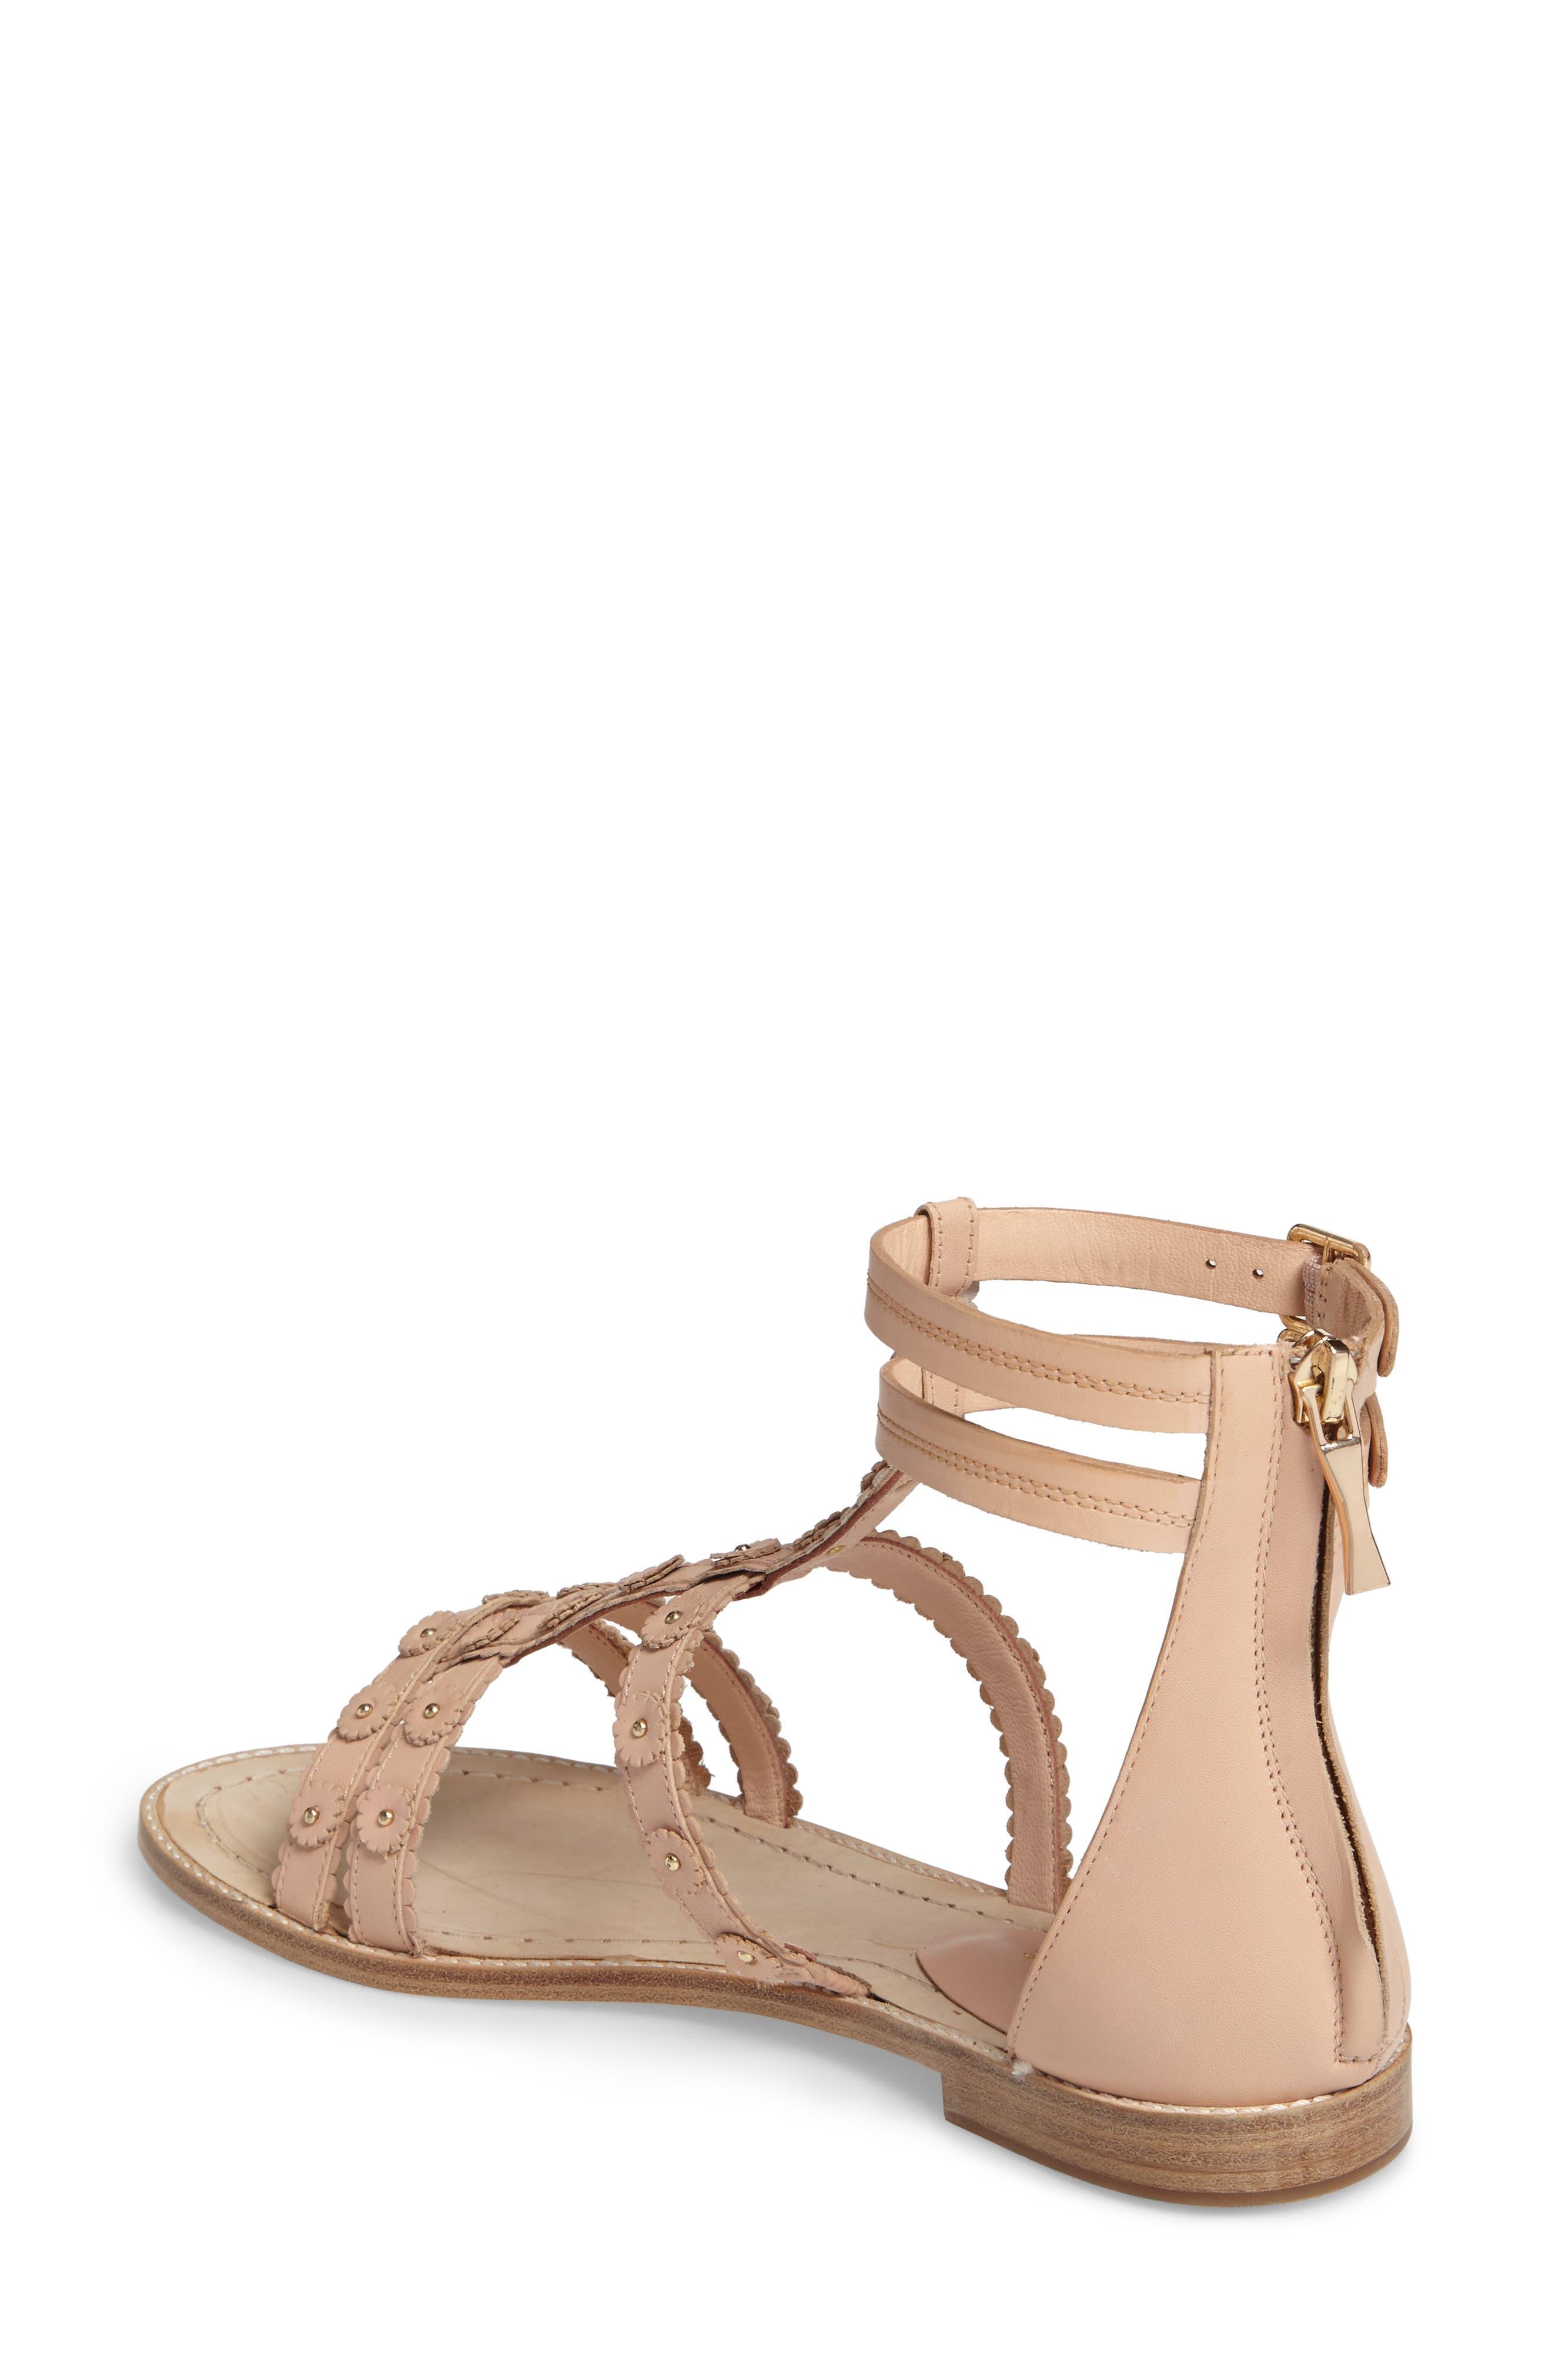 Alternate Image 2  - kate spade new york santina sandal (Women)